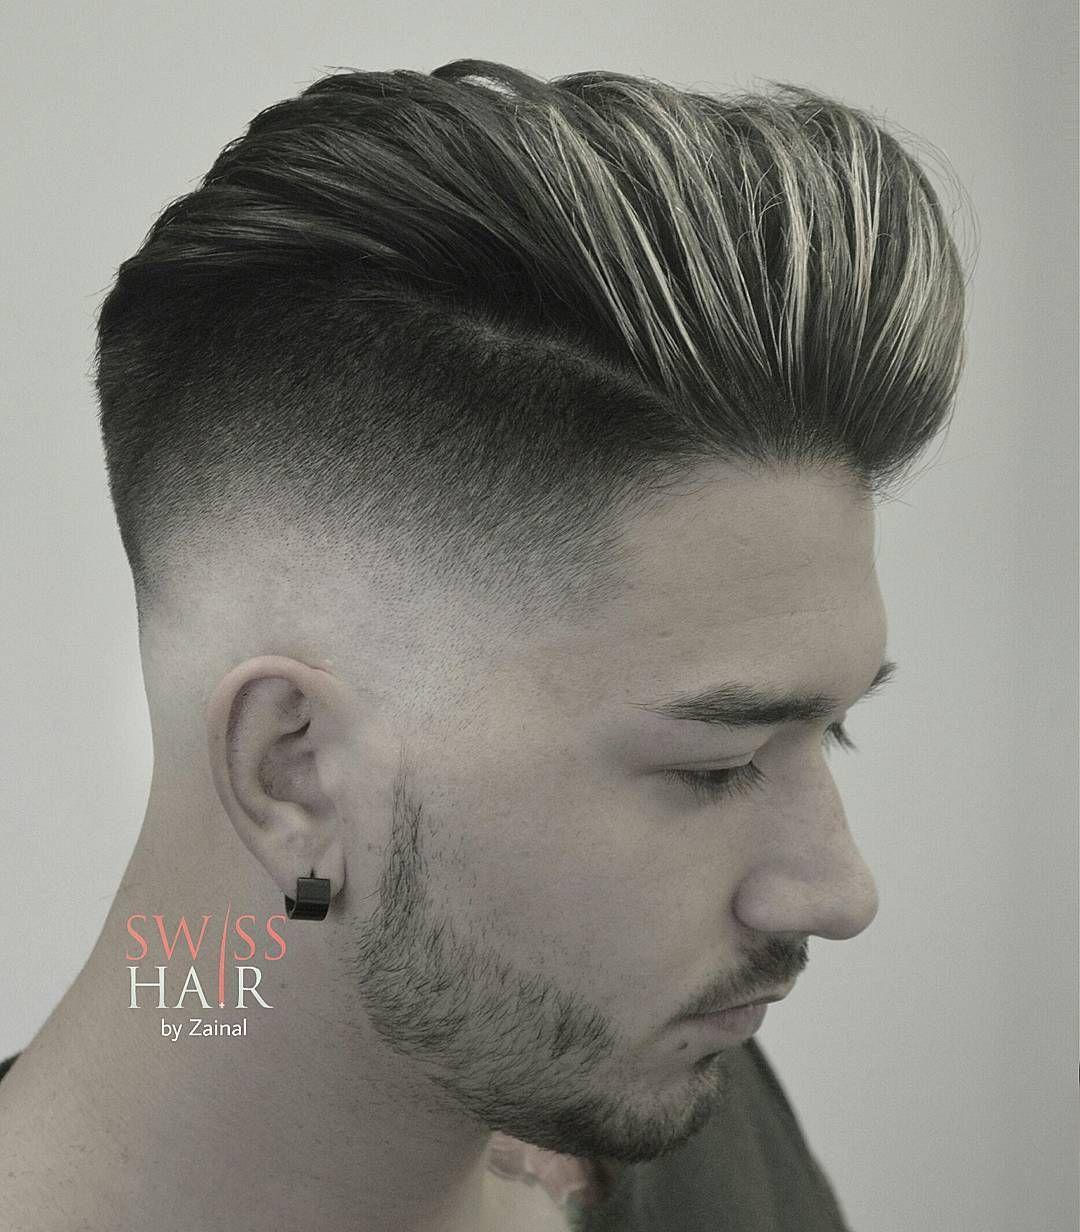 New Hairstyles For Men 80 New Hairstyles For Men 2018 Update  Pinterest  Haircuts